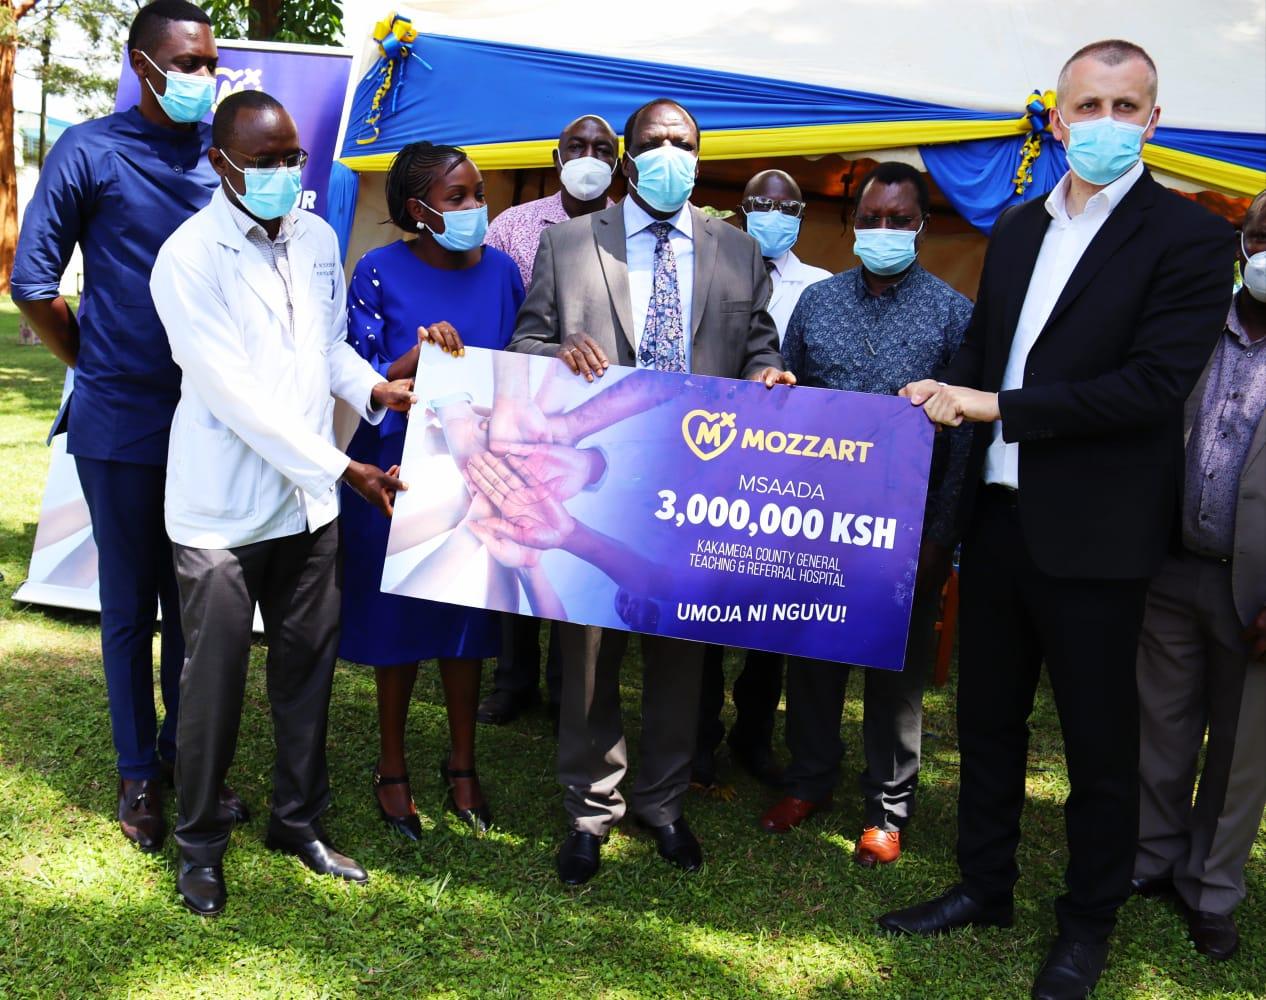 Mozzart lands in Kakamega County General Hospital with life-changing medical equipment worth Ksh 3 million